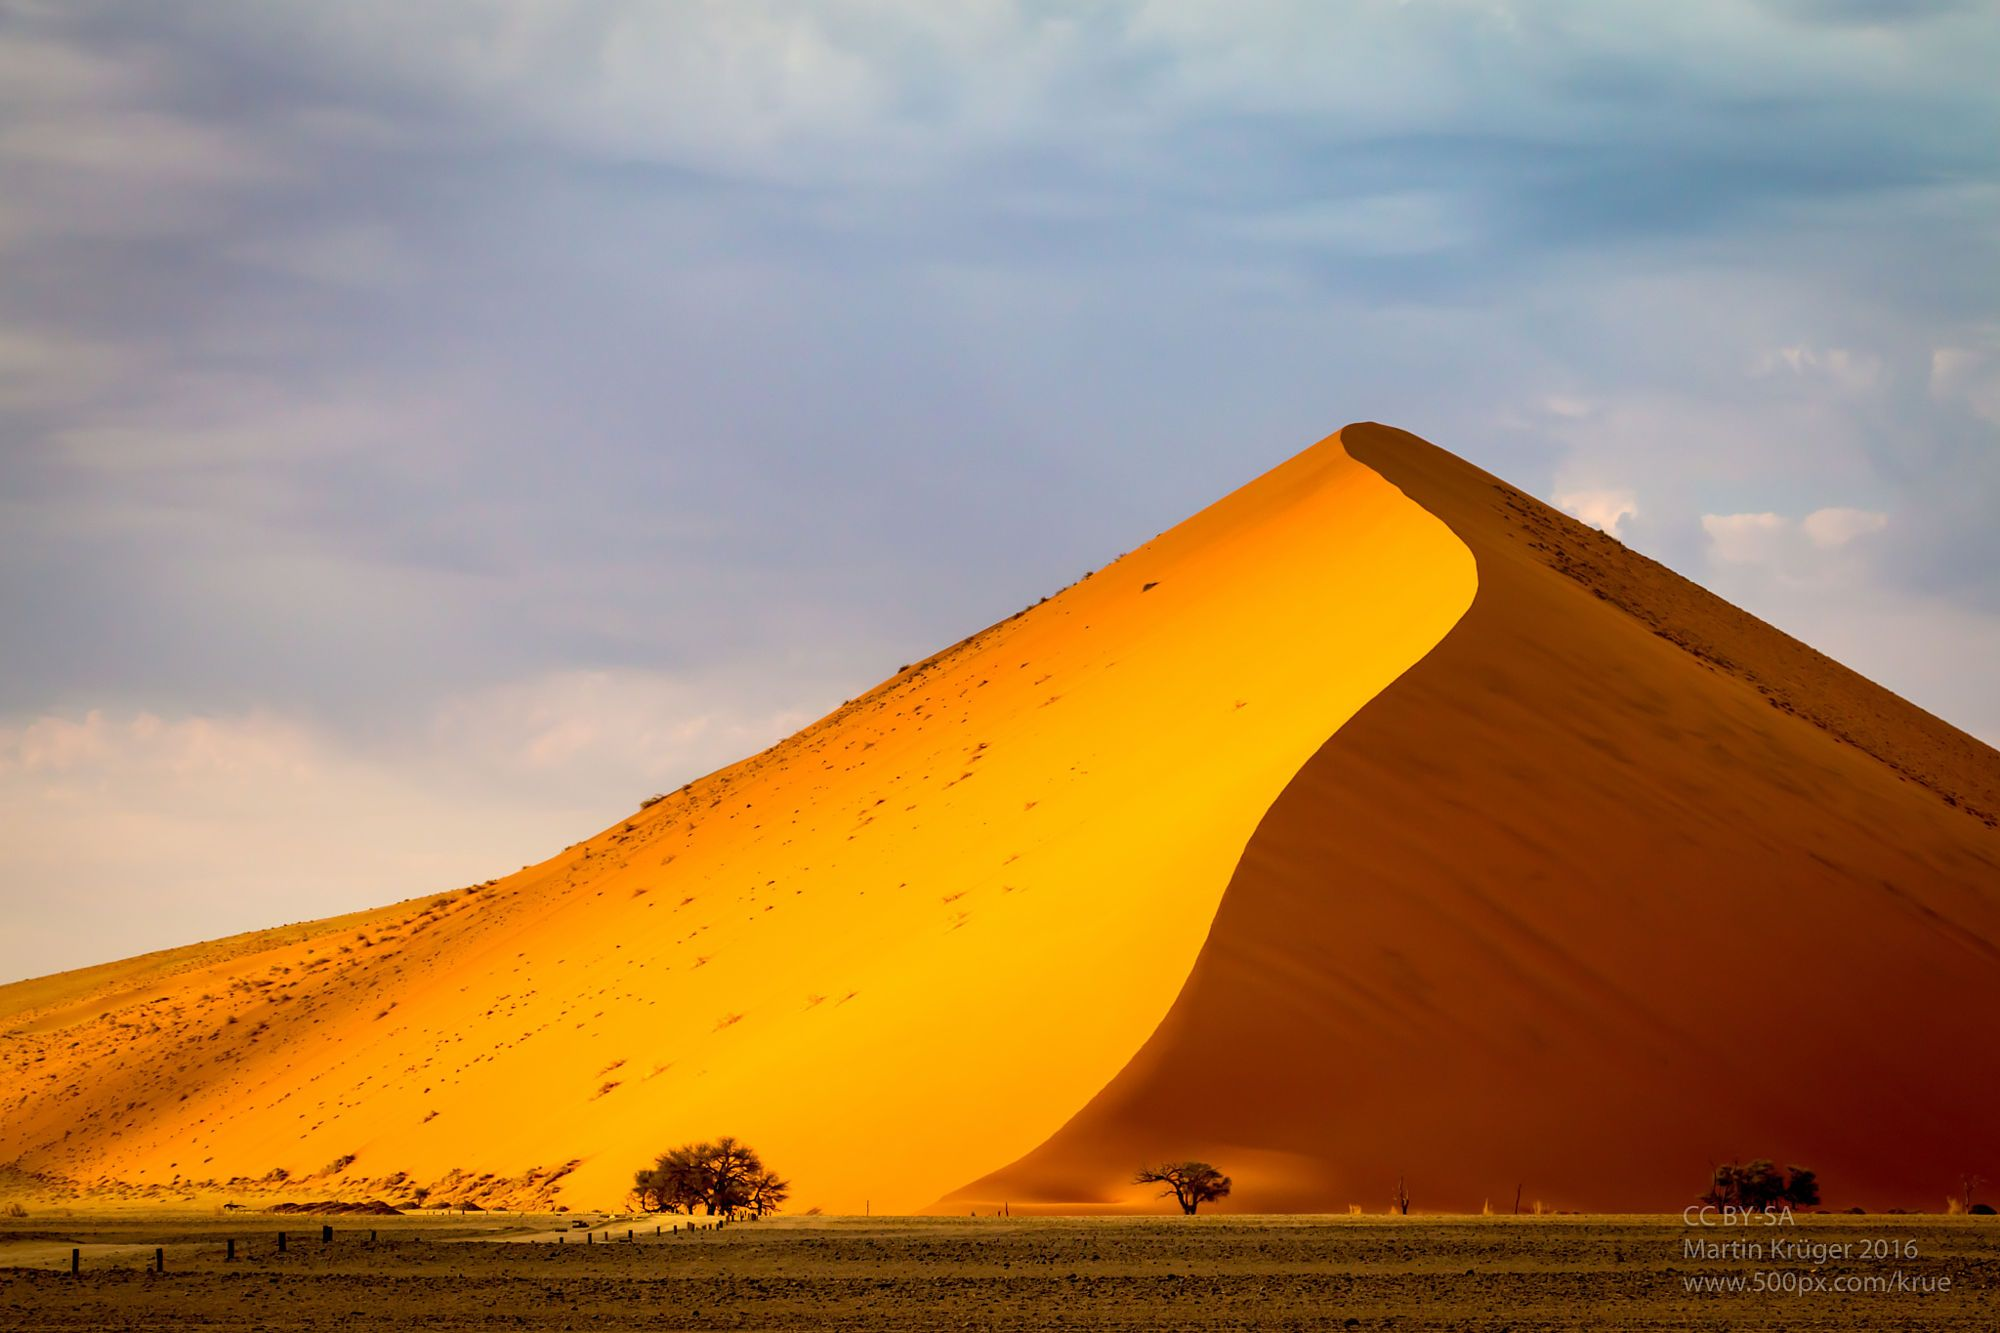 Dune 45 by Martin Krueger - Photo 163316423 - 500px